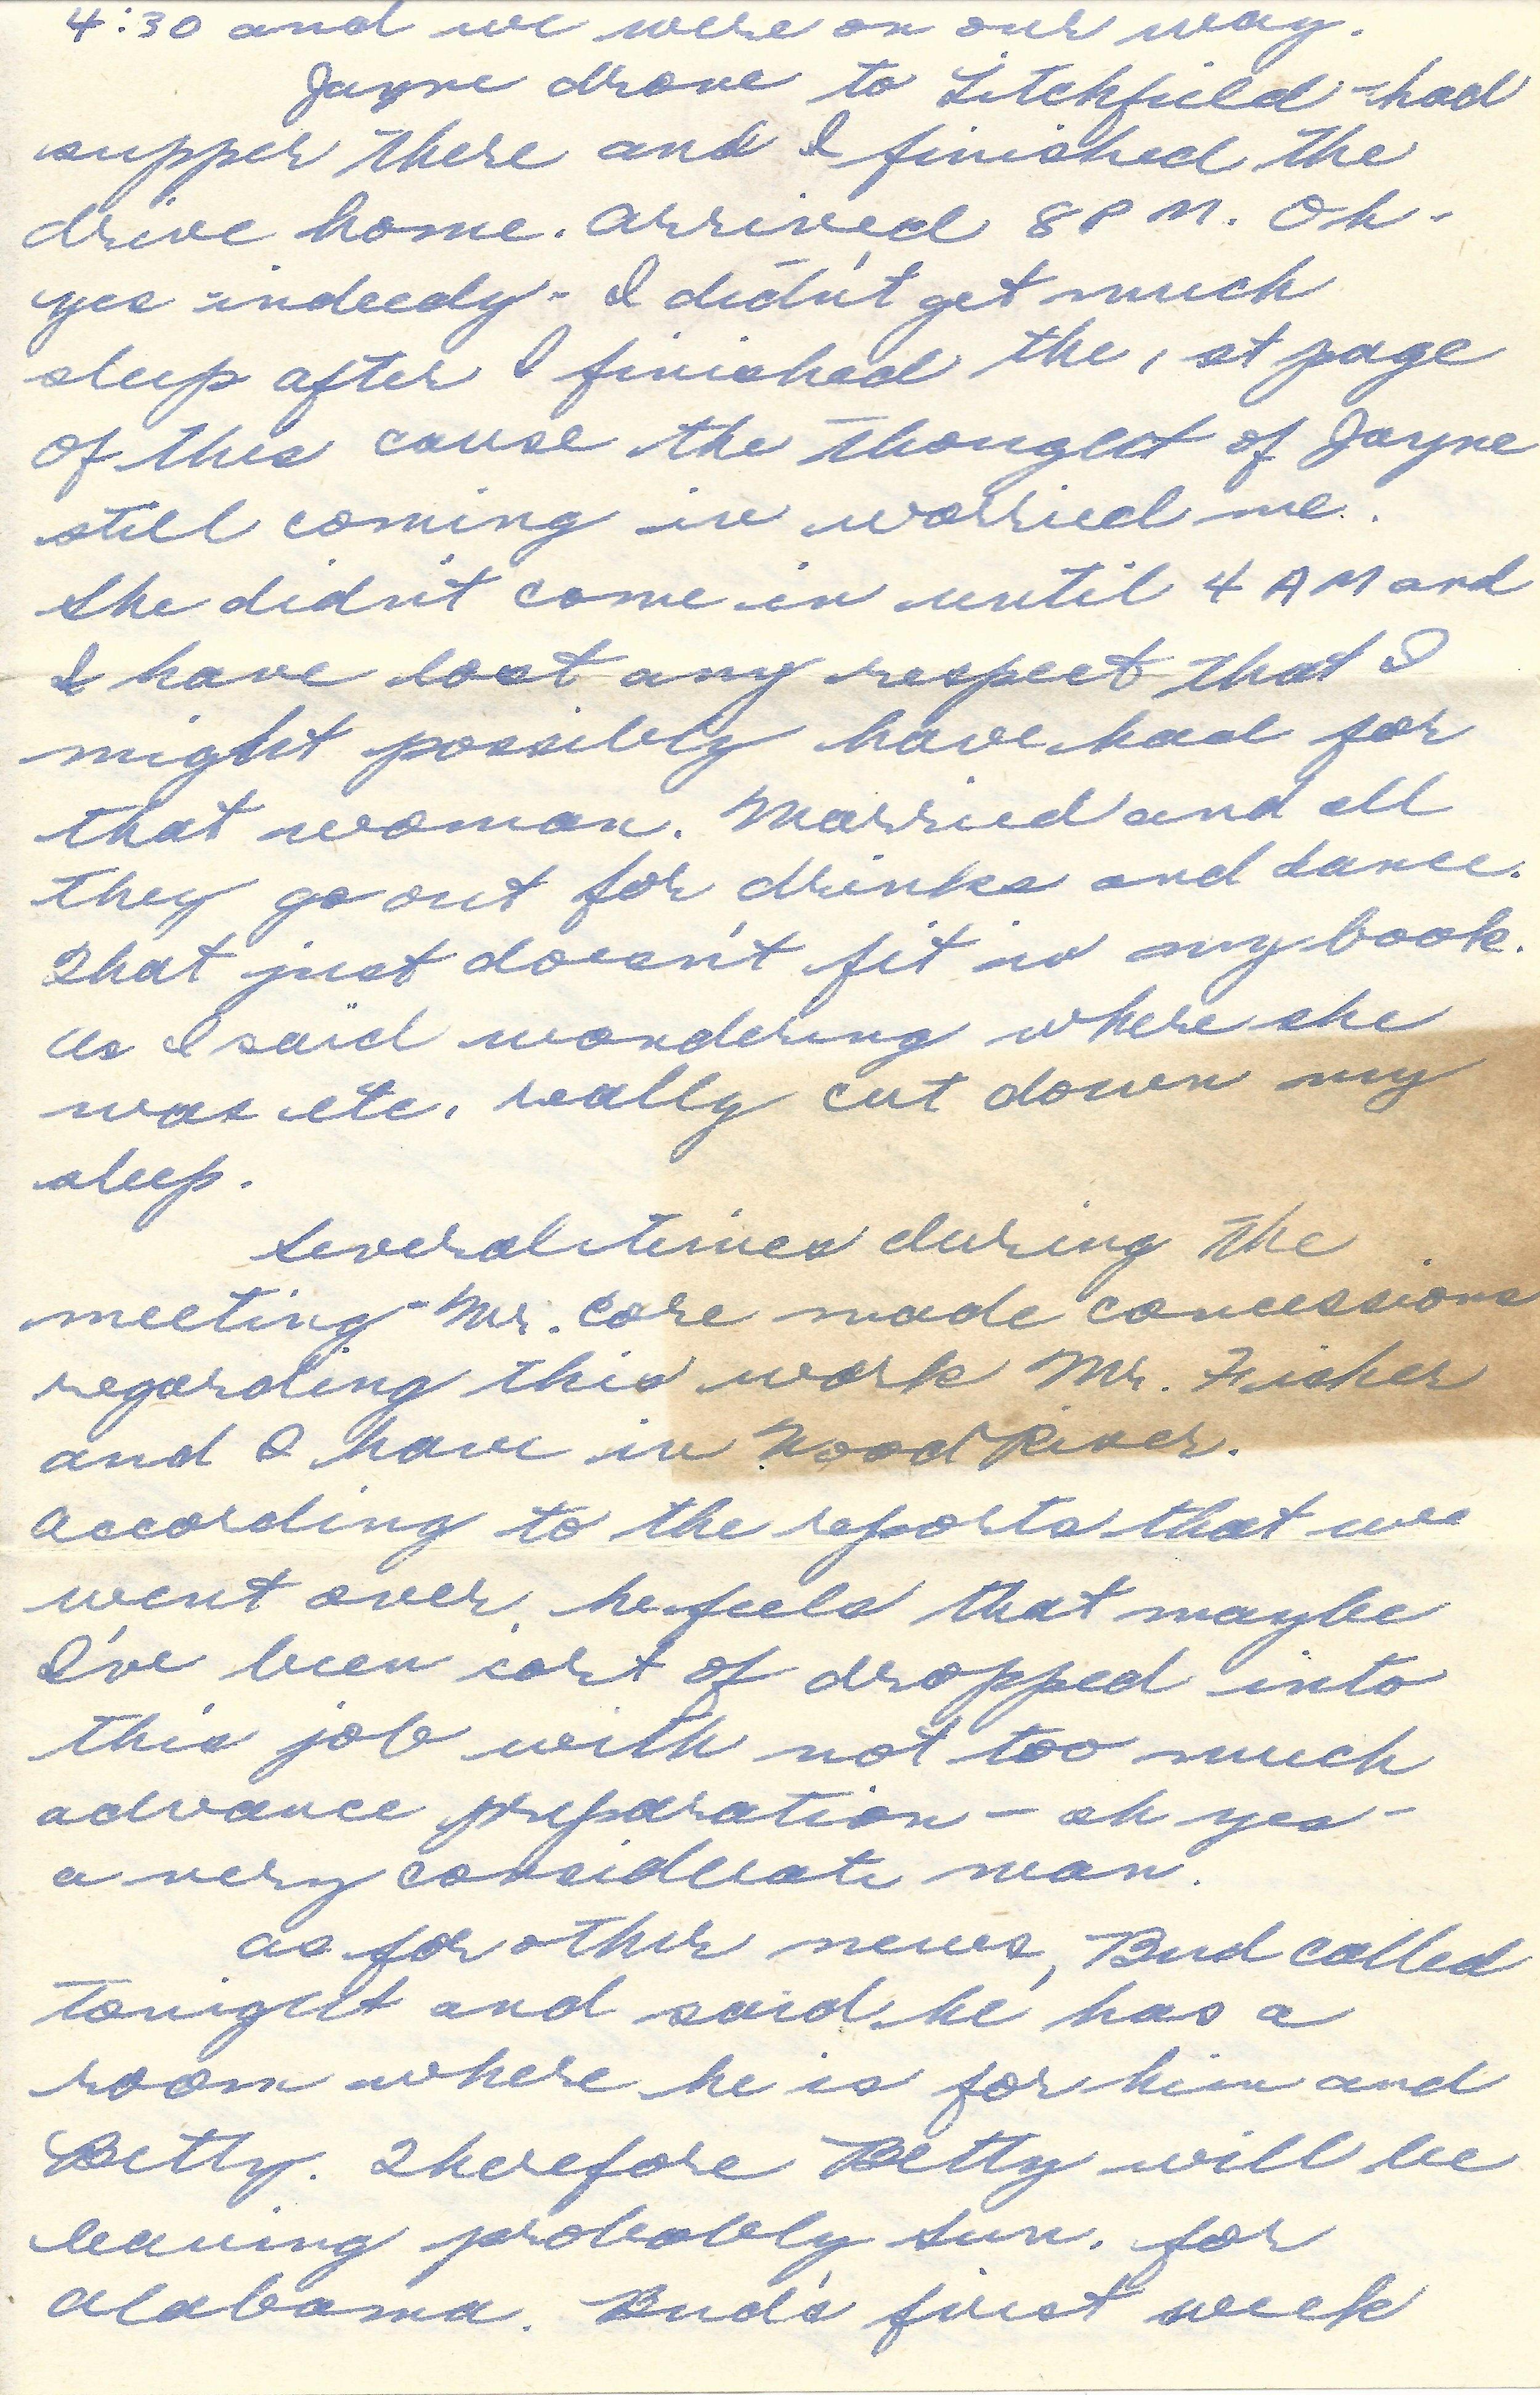 11. Jan. 21, 1953 (Oma)_Page_5.jpg